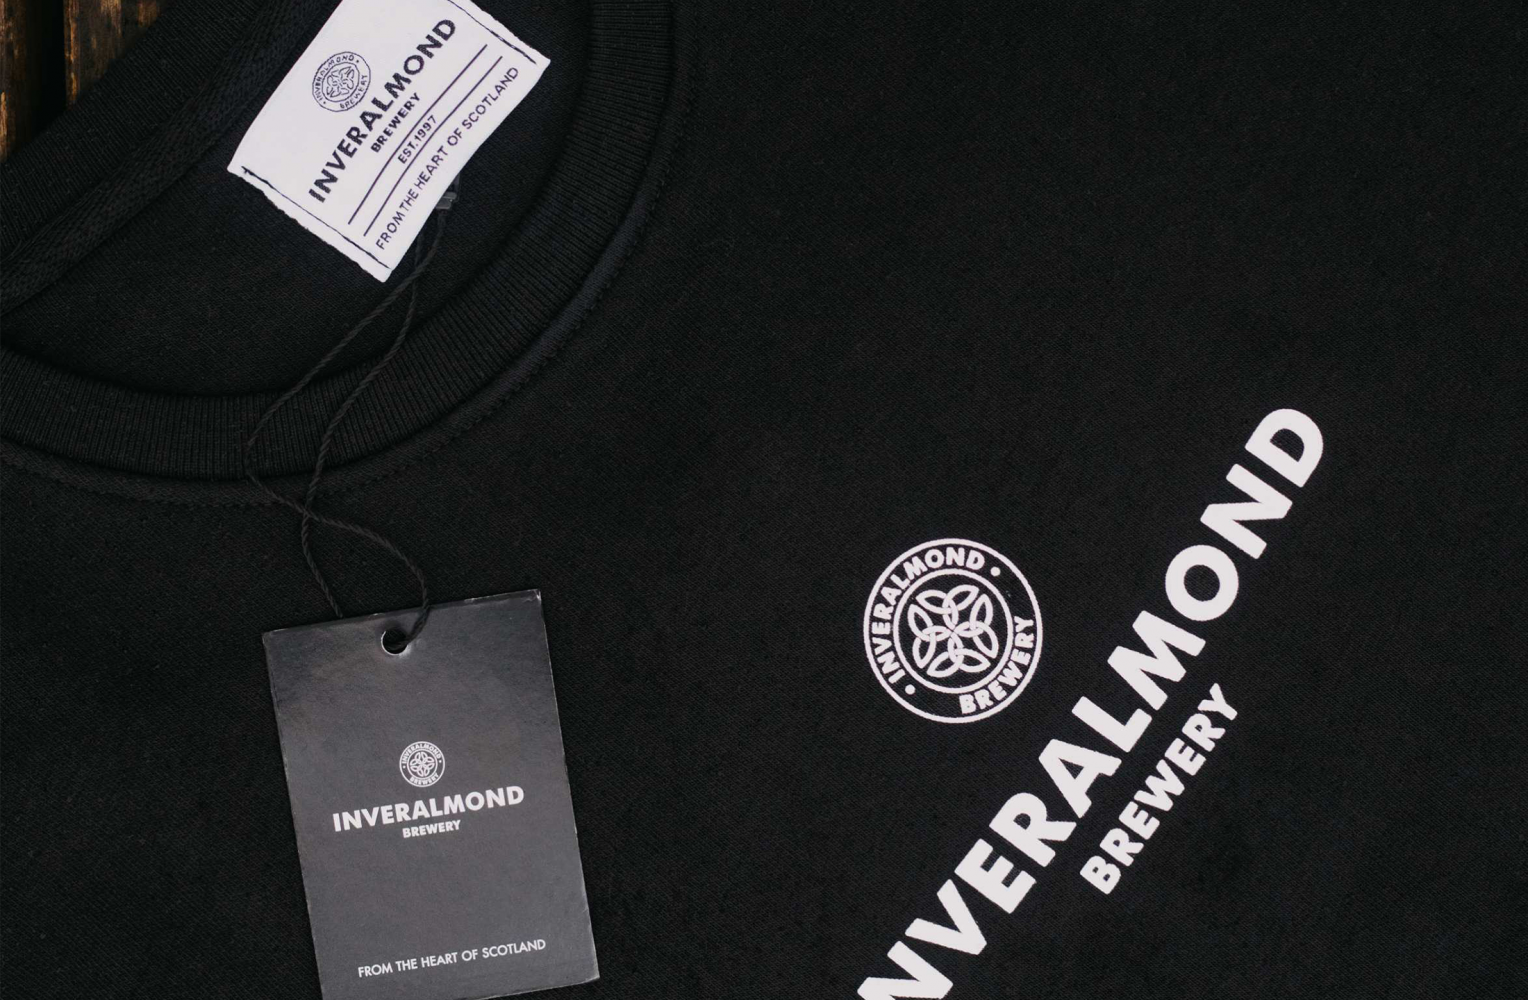 Inveralmond Sweatshirt close up